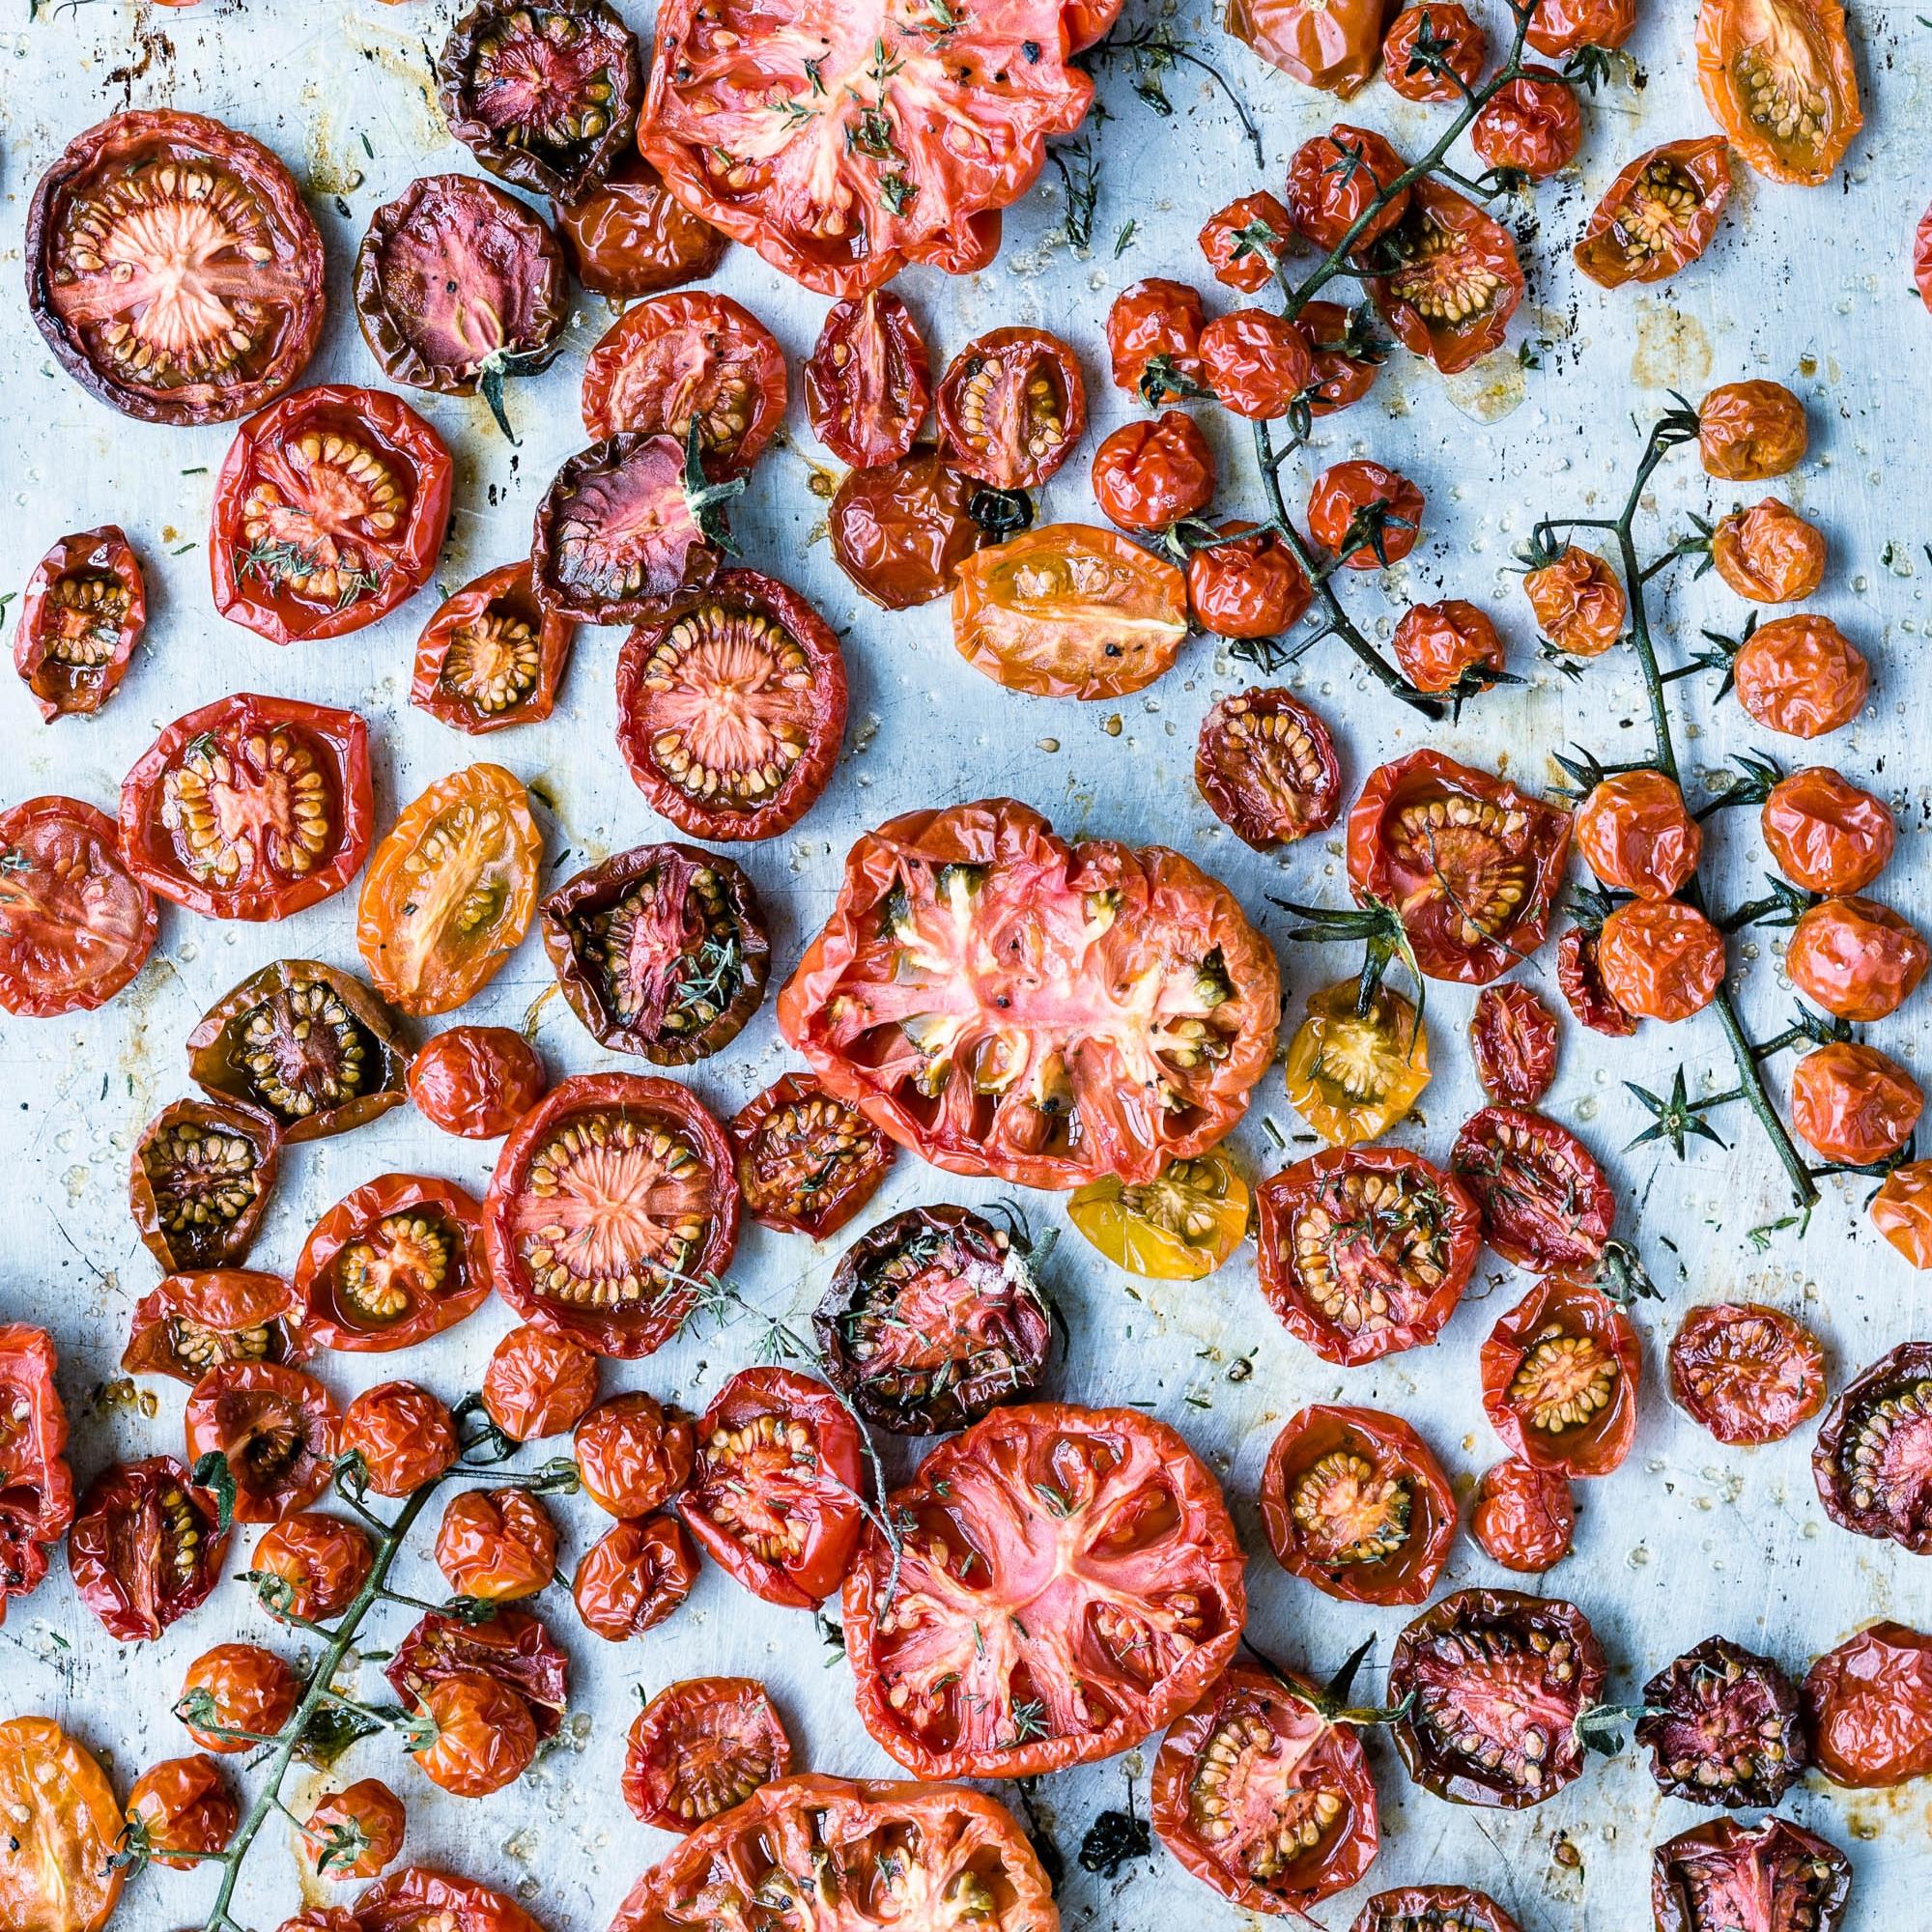 Ofengetrocknete Tomaten vom Blech - so simpel wie köstlich!